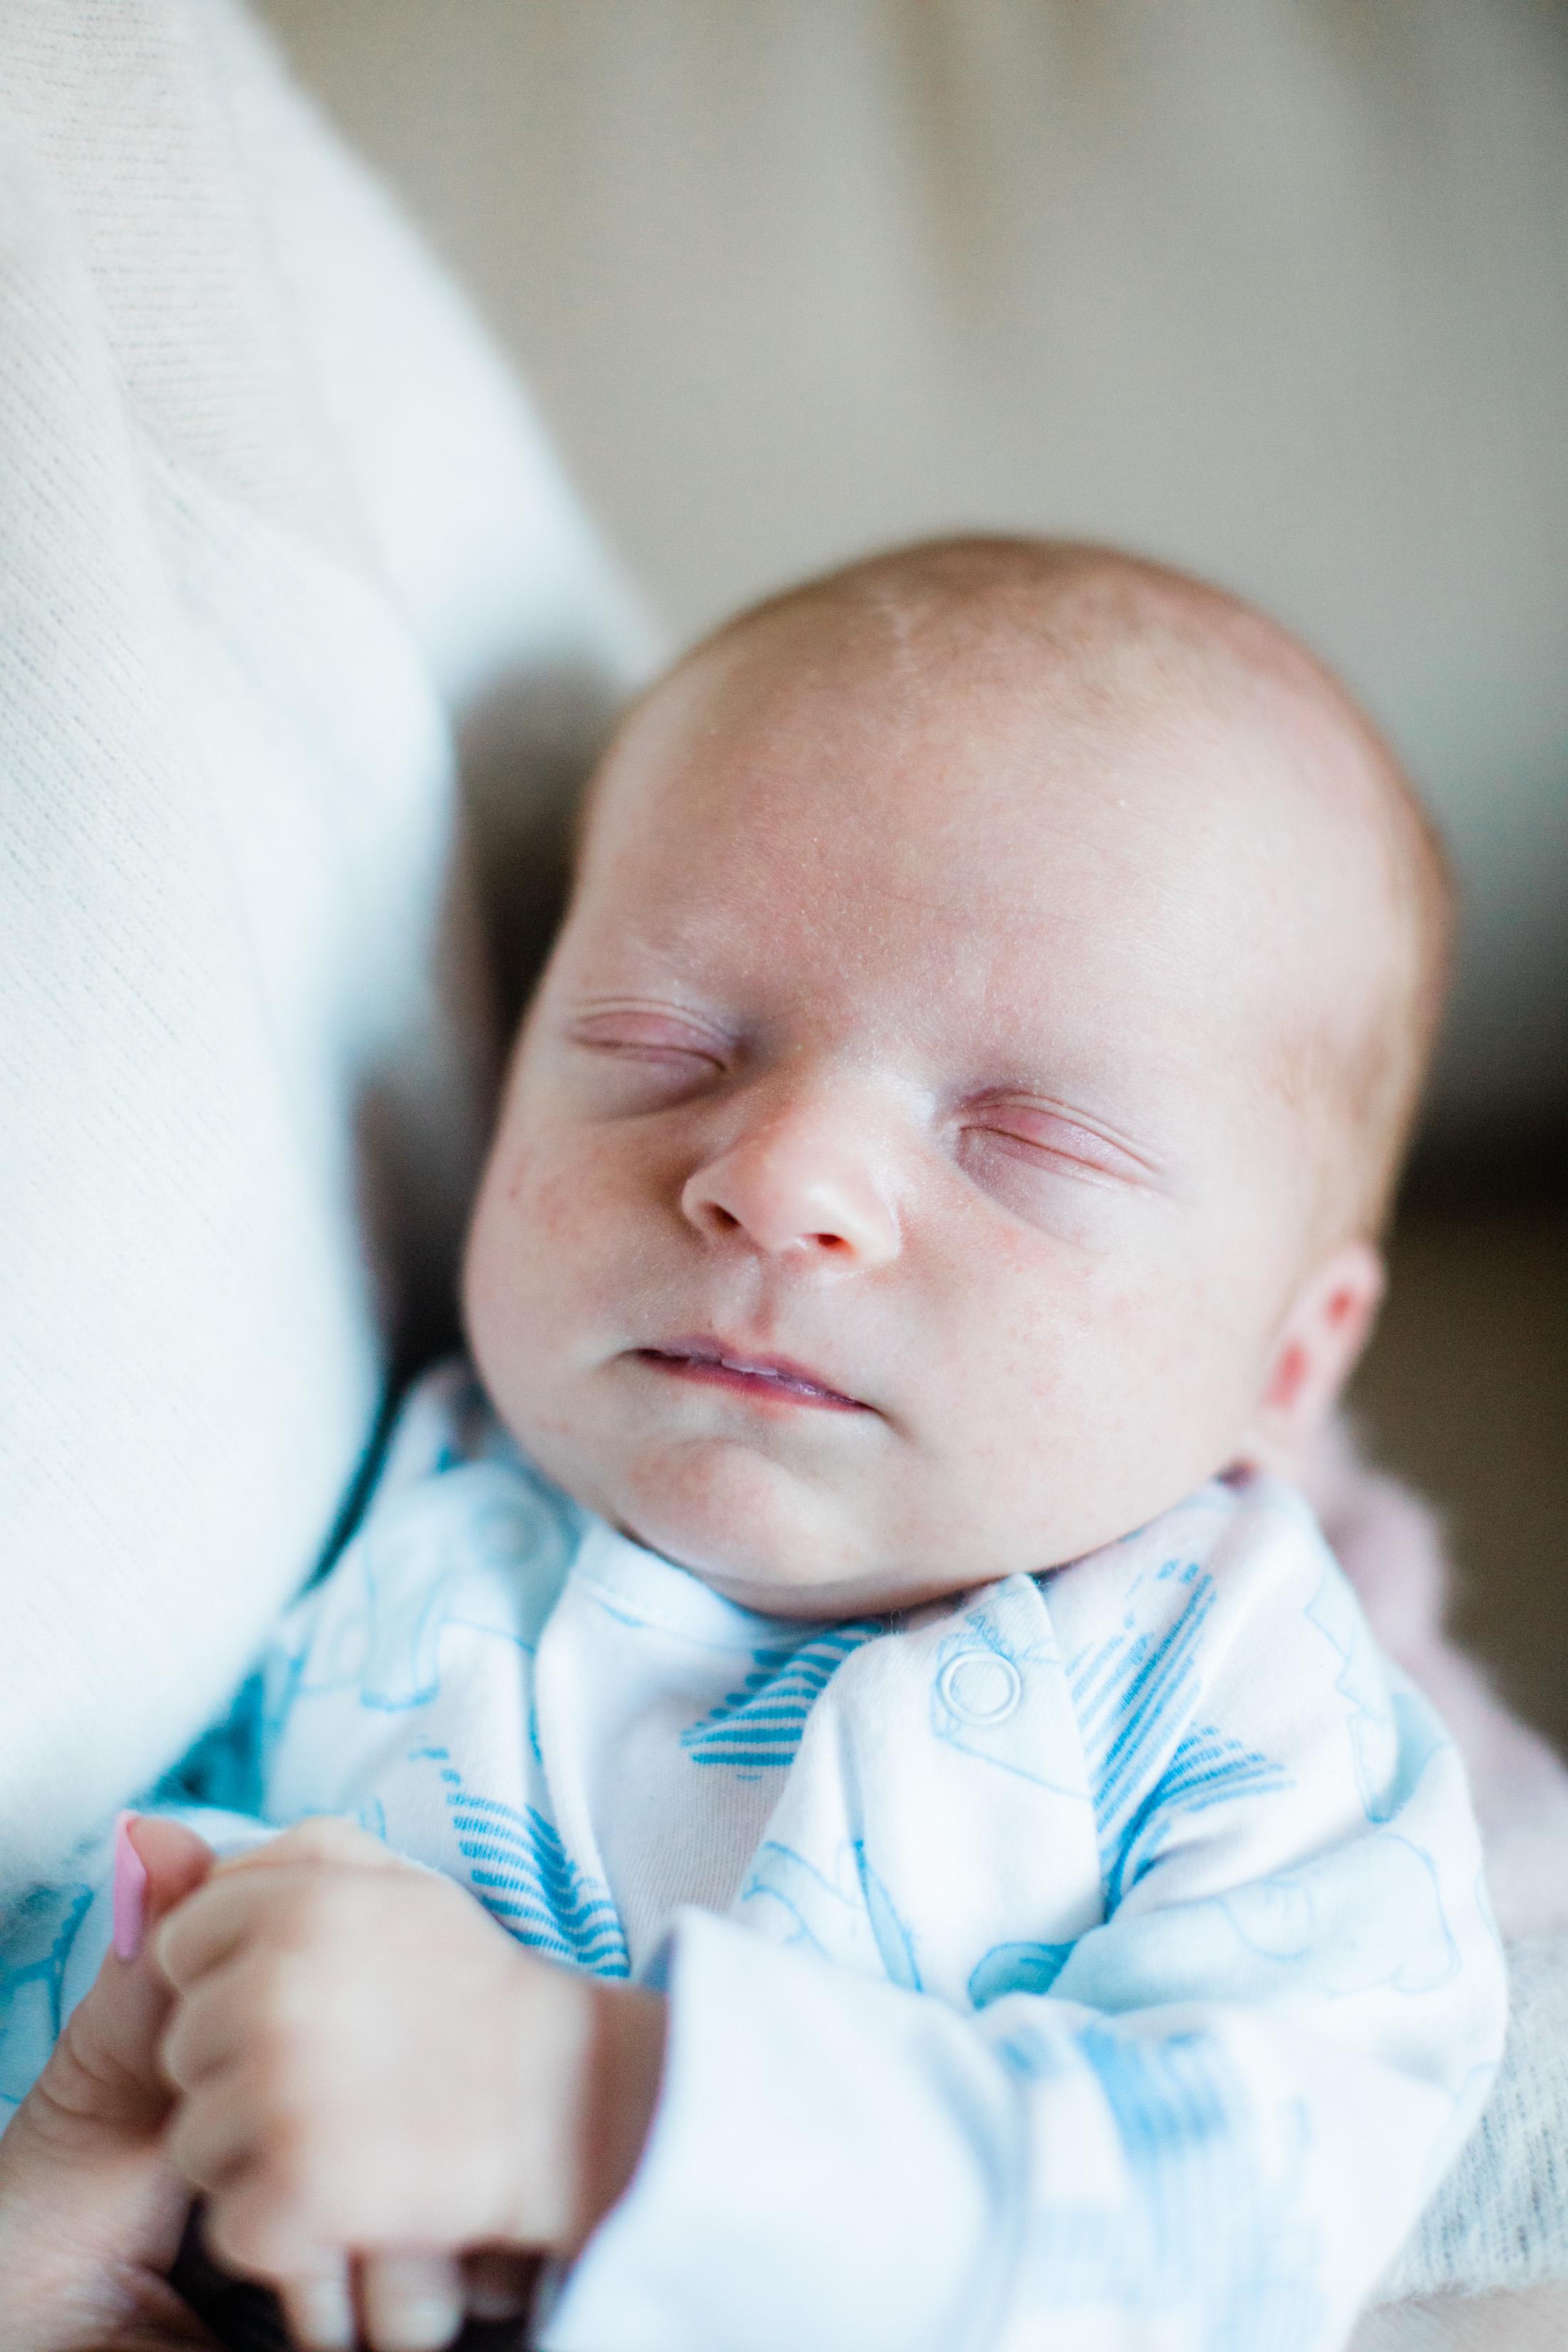 NewbornFrancis-1.jpg